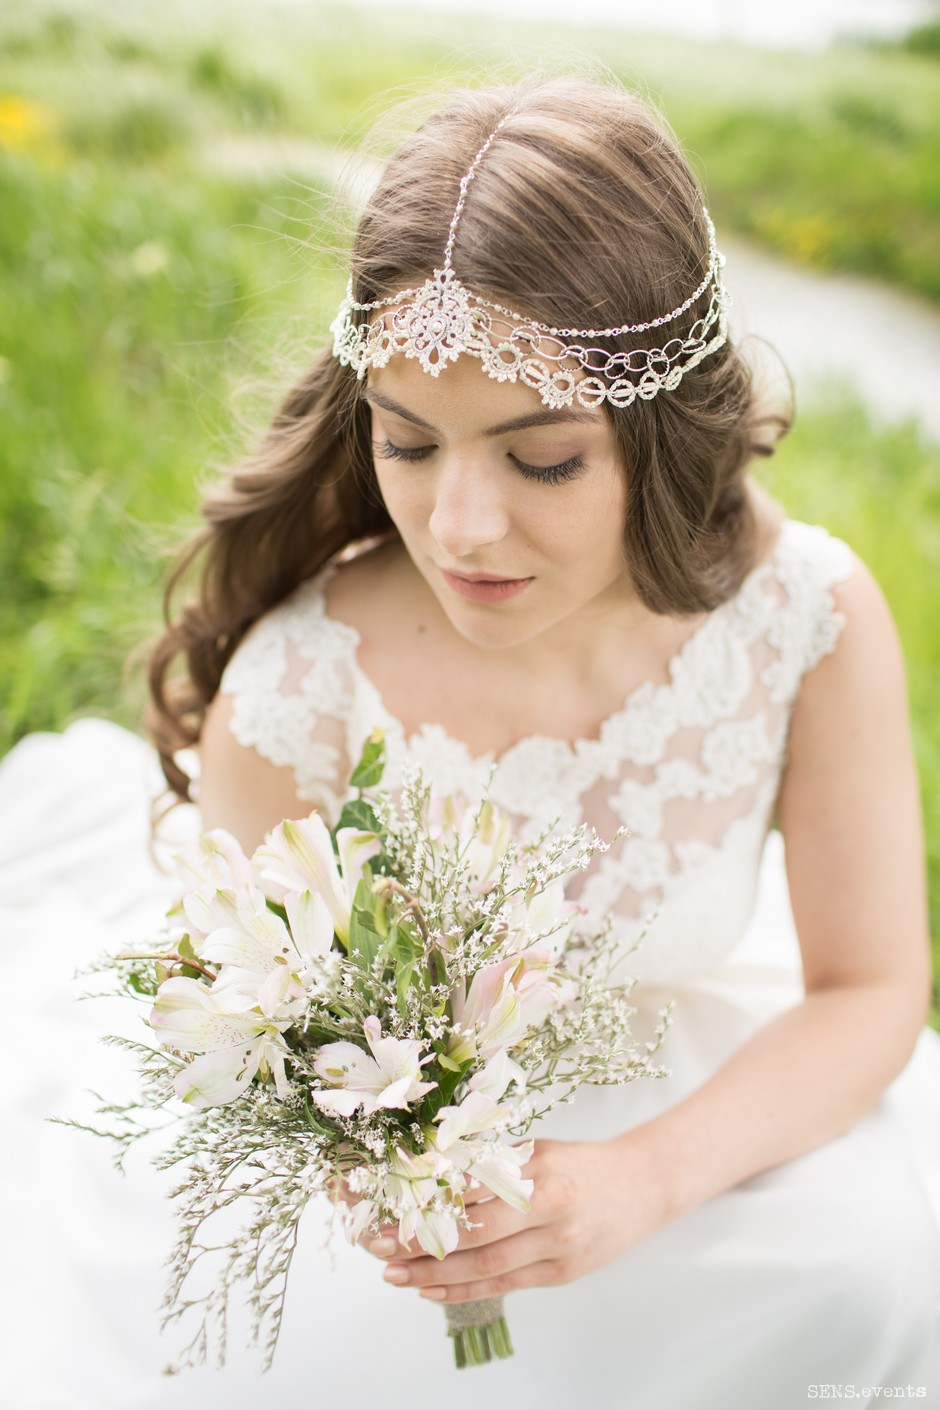 Sens_events_couple_2_Ionela_Sergiu-036